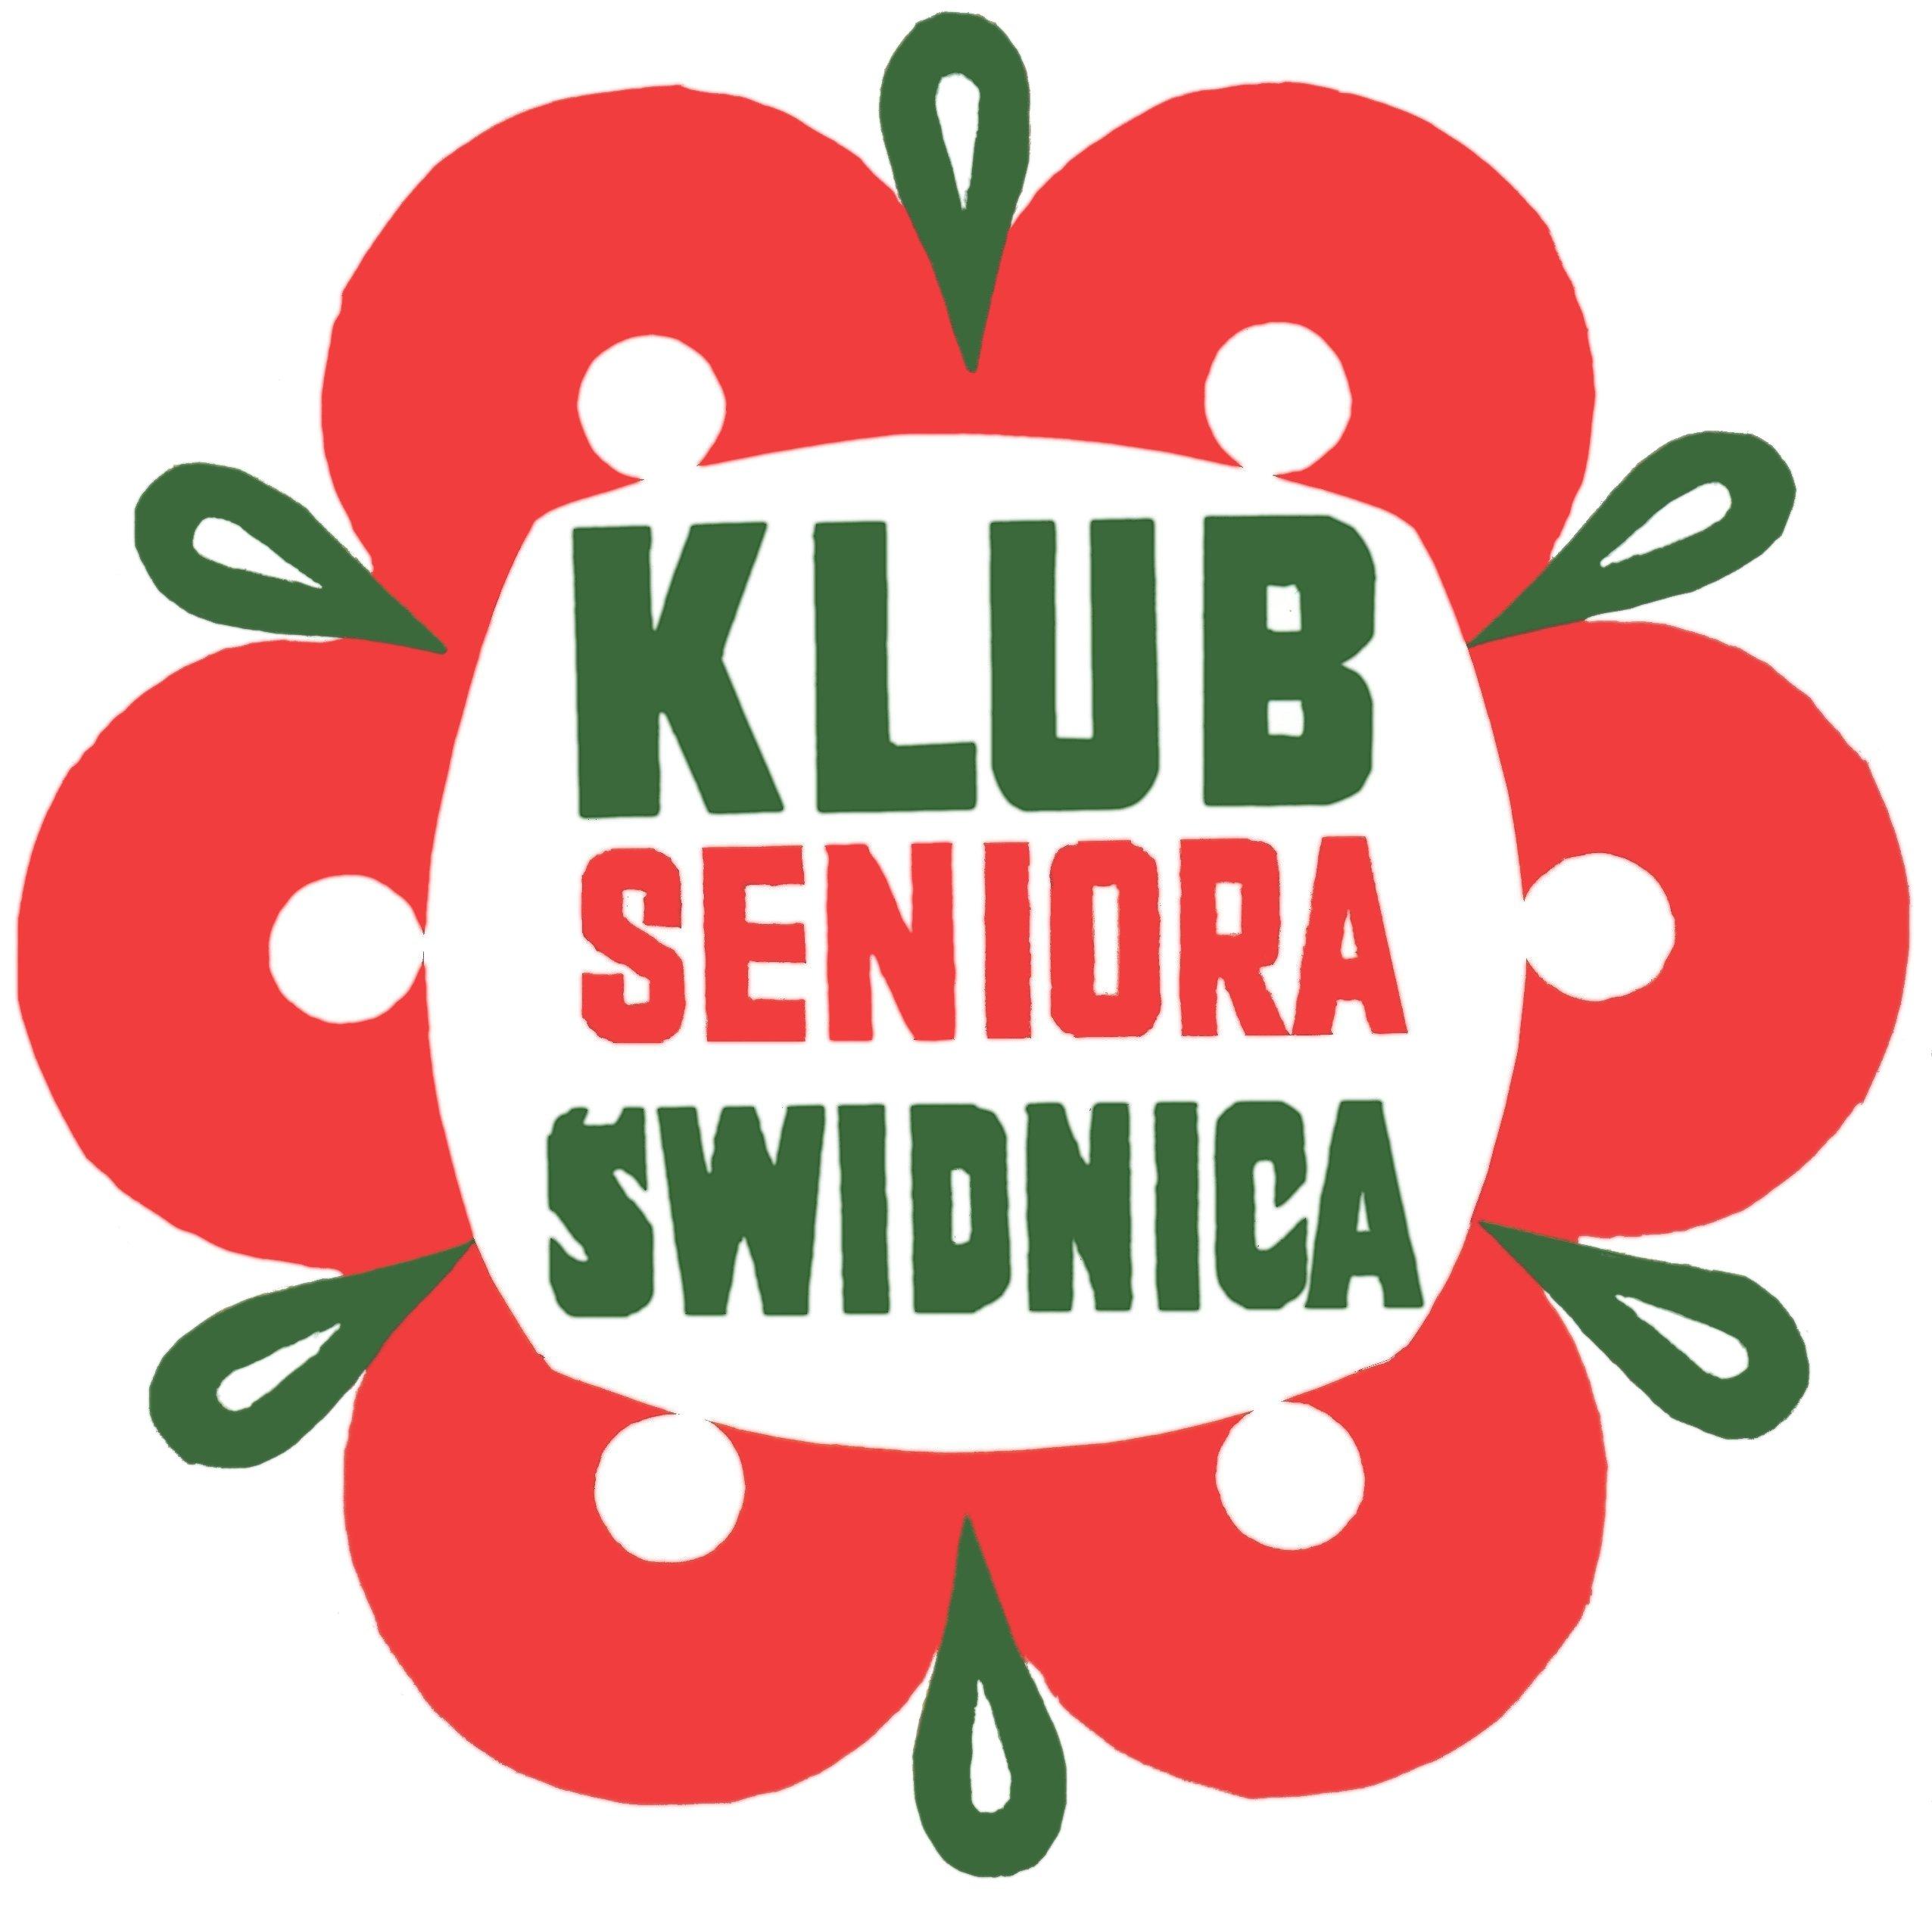 klub seniora logo